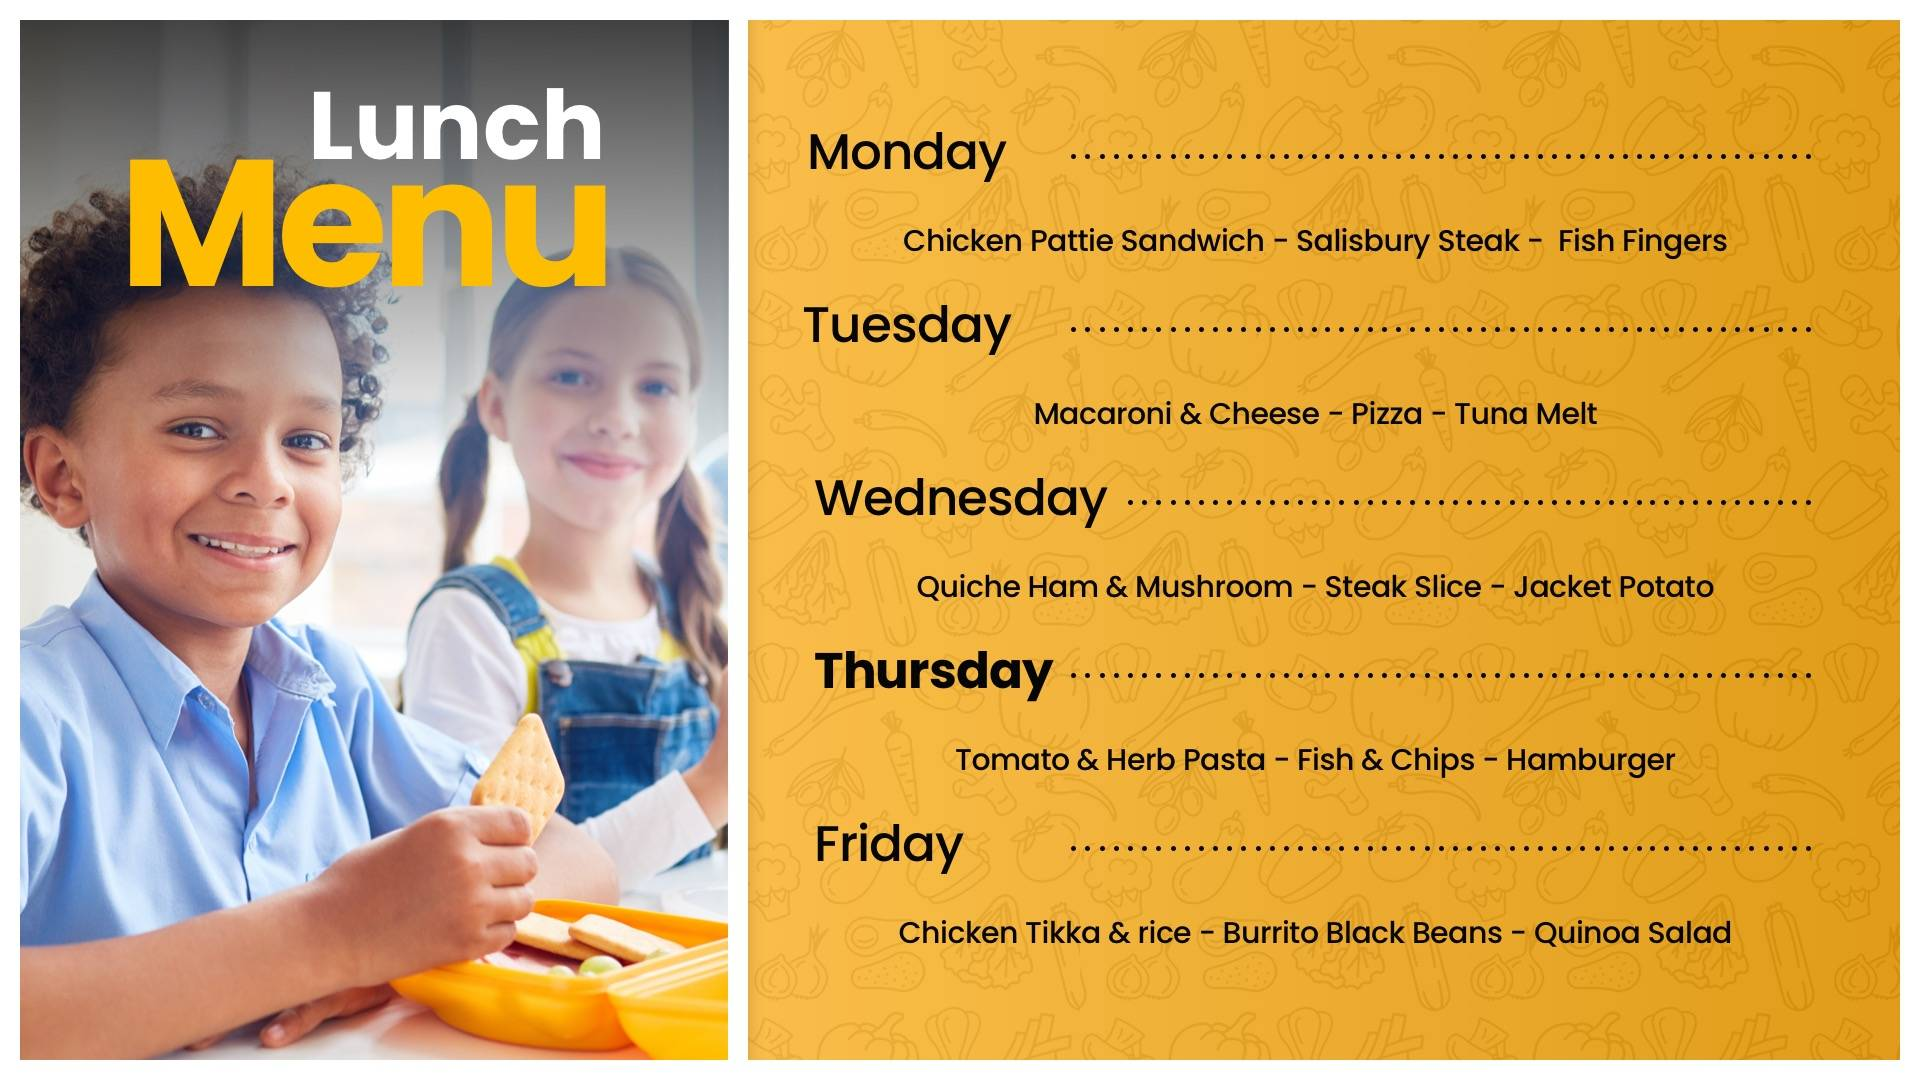 Weekly Lunch Menu List Digital Signage Template